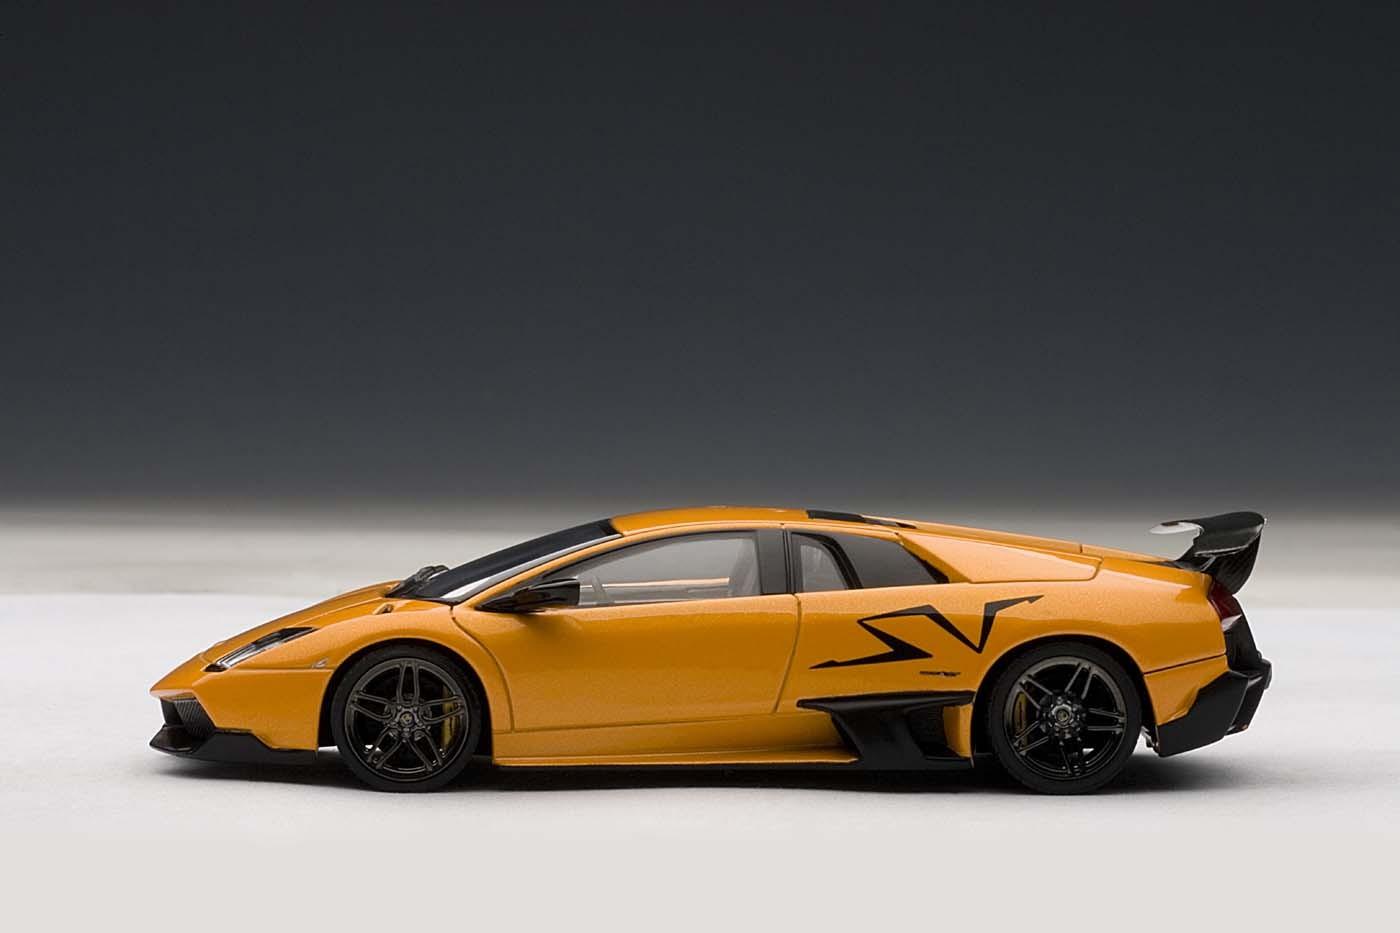 Highly Detailed Autoart Orange Lamborghini Murcielago Lp670 4 Sv Autoart 54627 Die Cast Model Scale 1 43 Arancio Atlas Eztoys Diecast Models And Collectibles